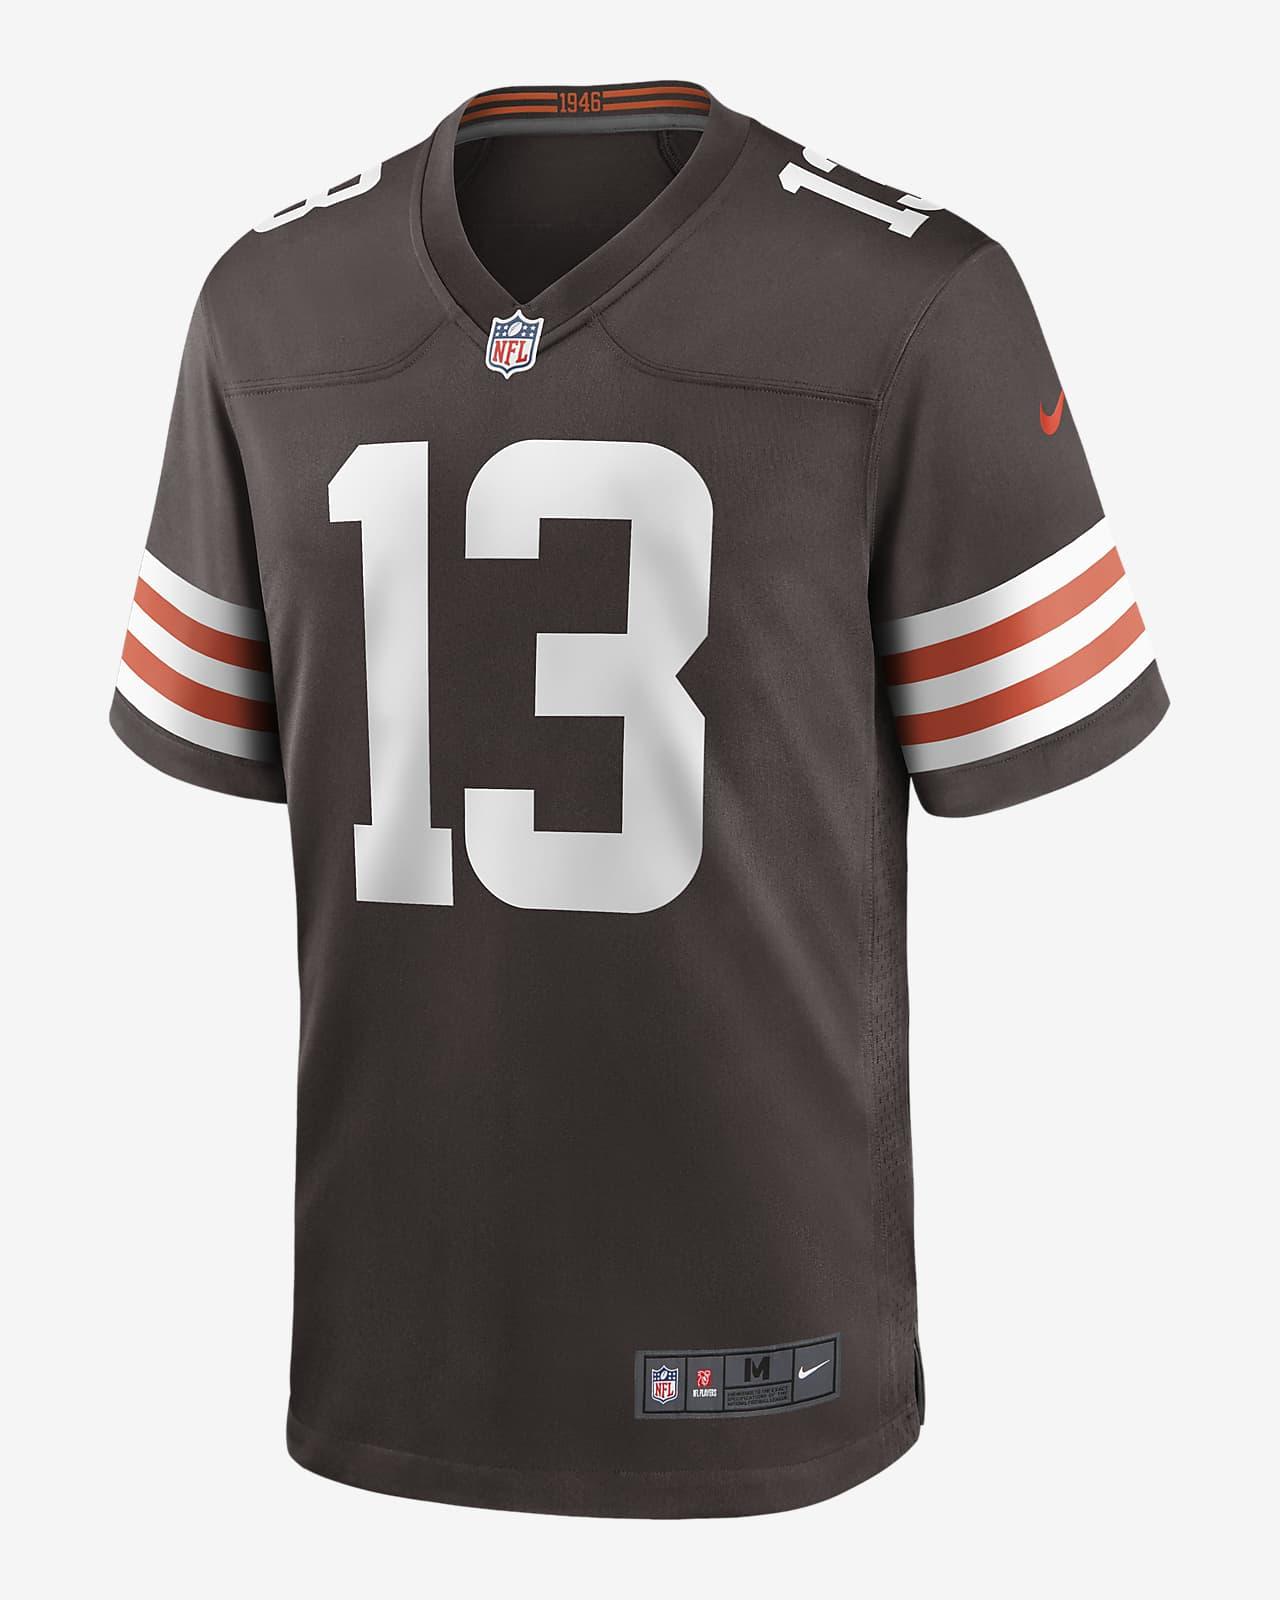 NFL Cleveland Browns (Odell Beckham Jr.) American-Football-Spieltrikot für Herren